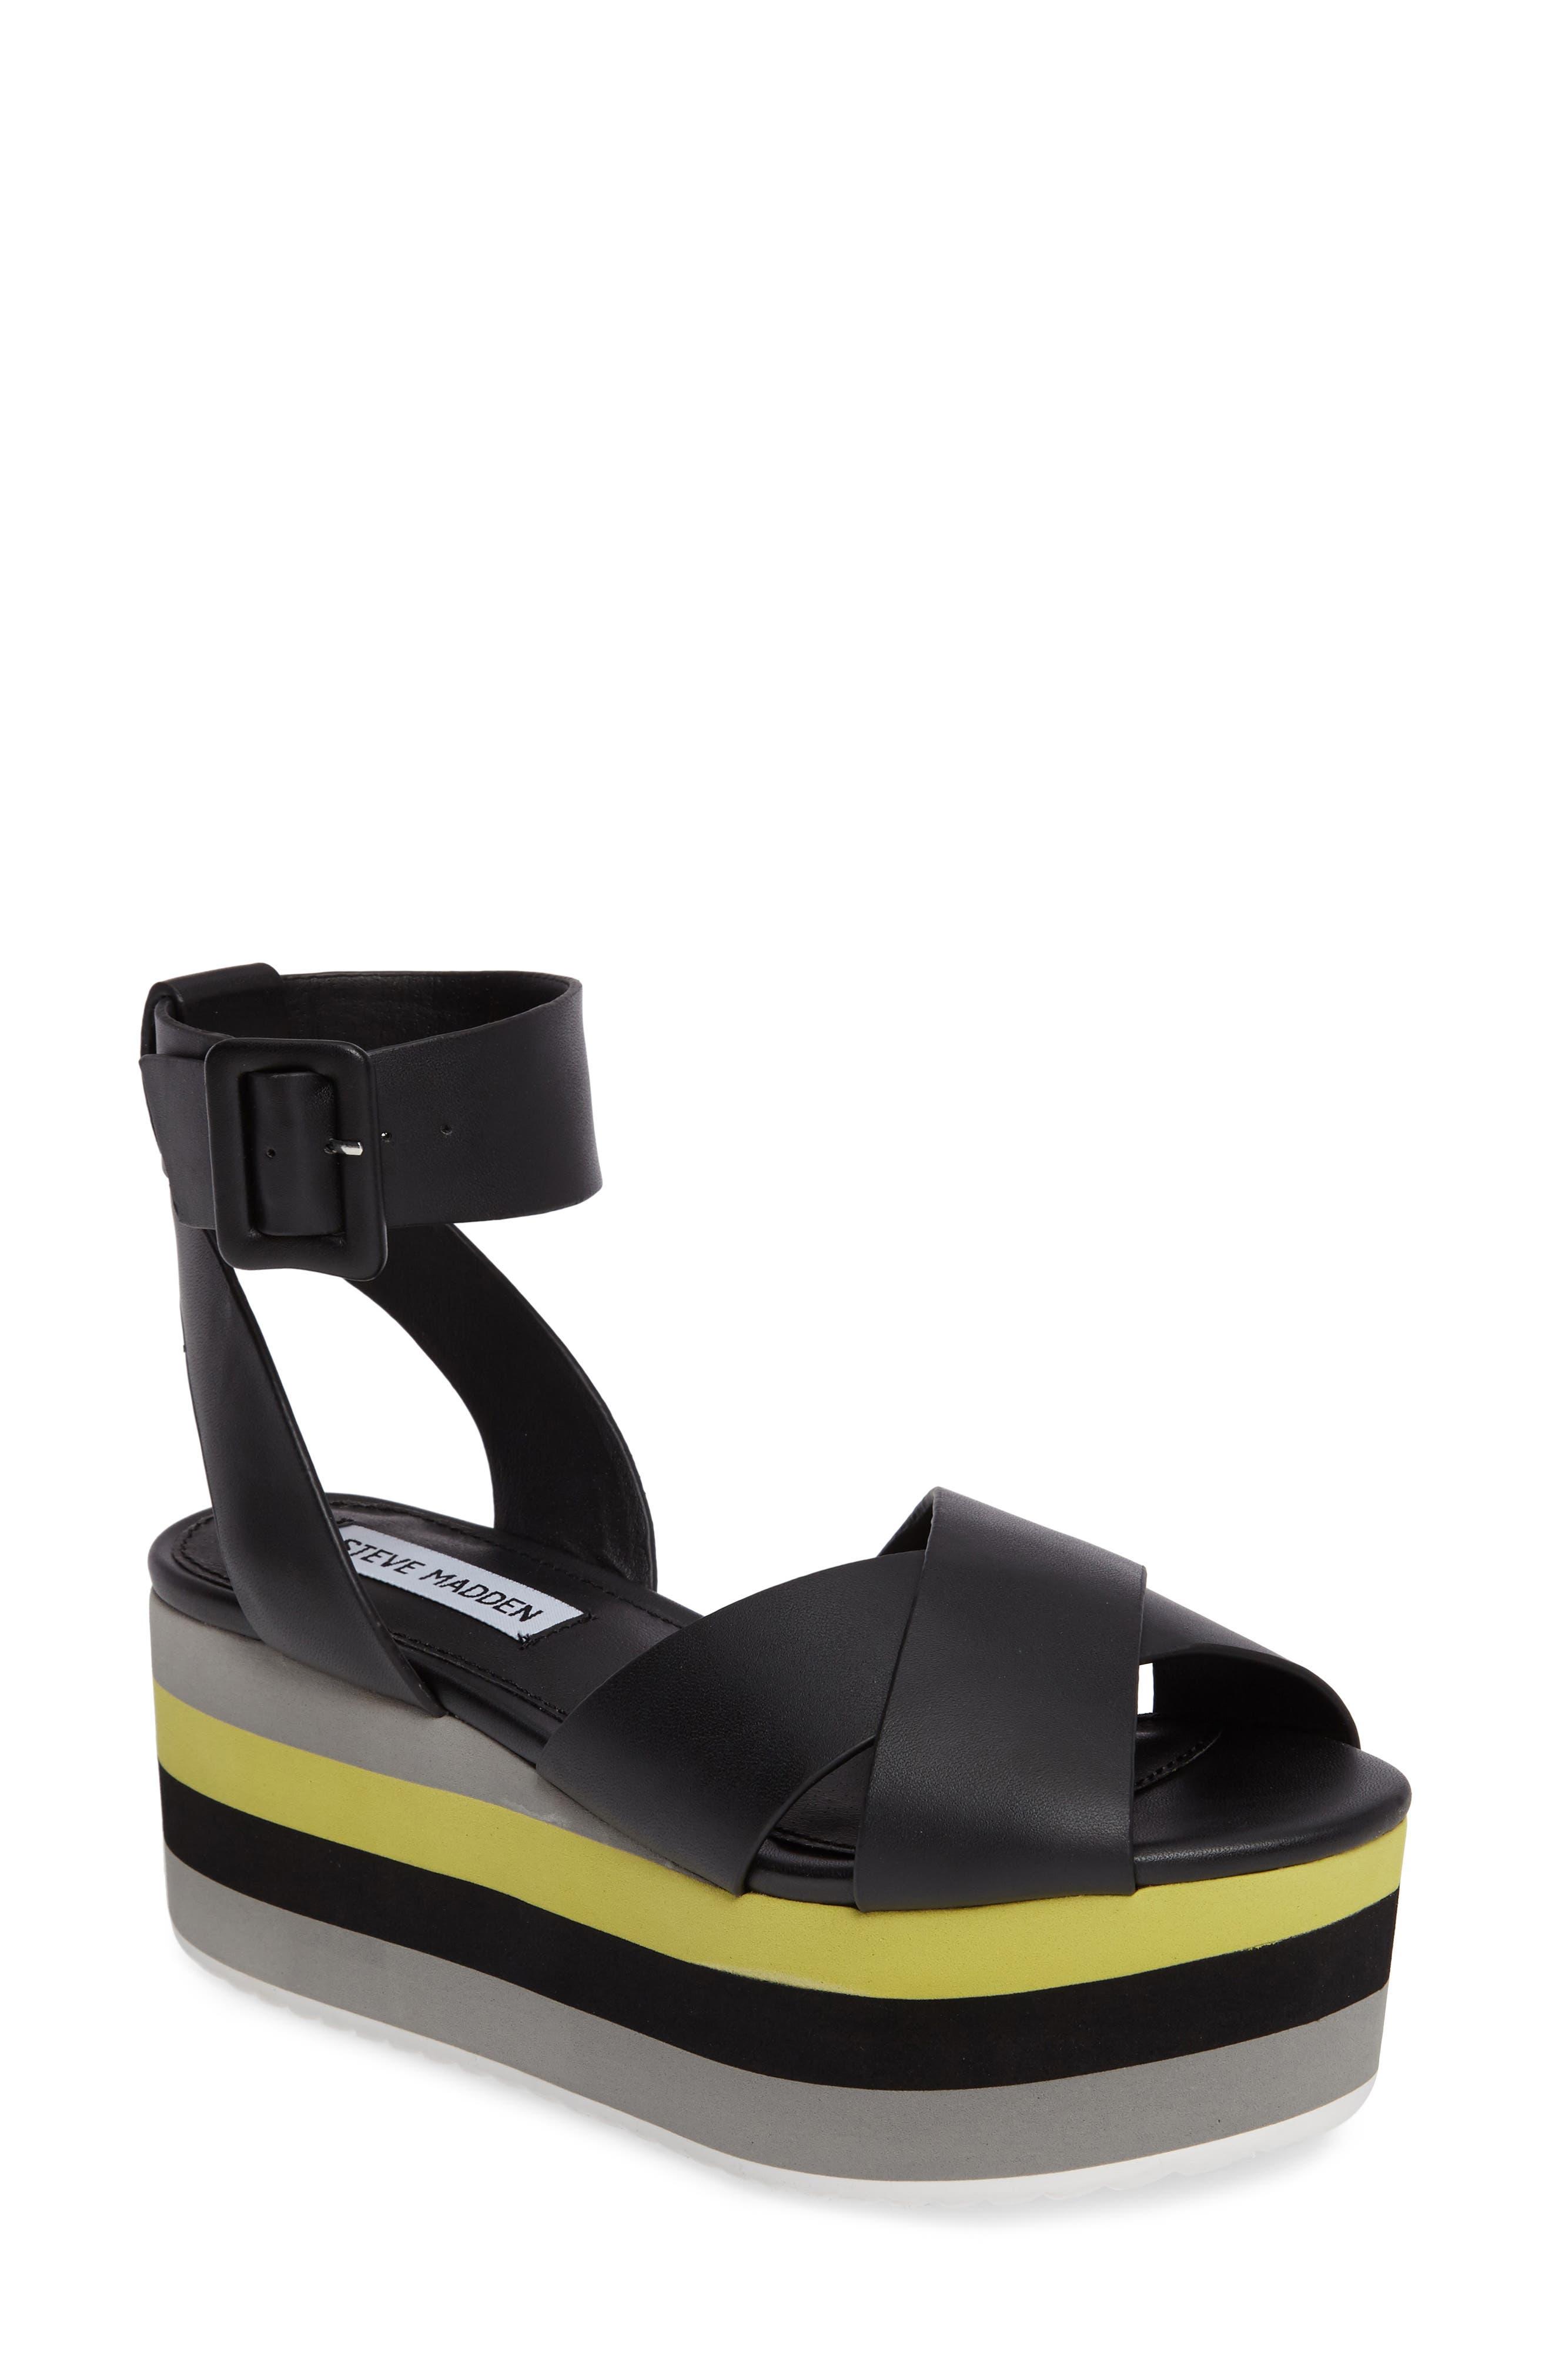 Alternate Image 1 Selected - Steve Madden Macer Cuffed Platform Sandal (Women)